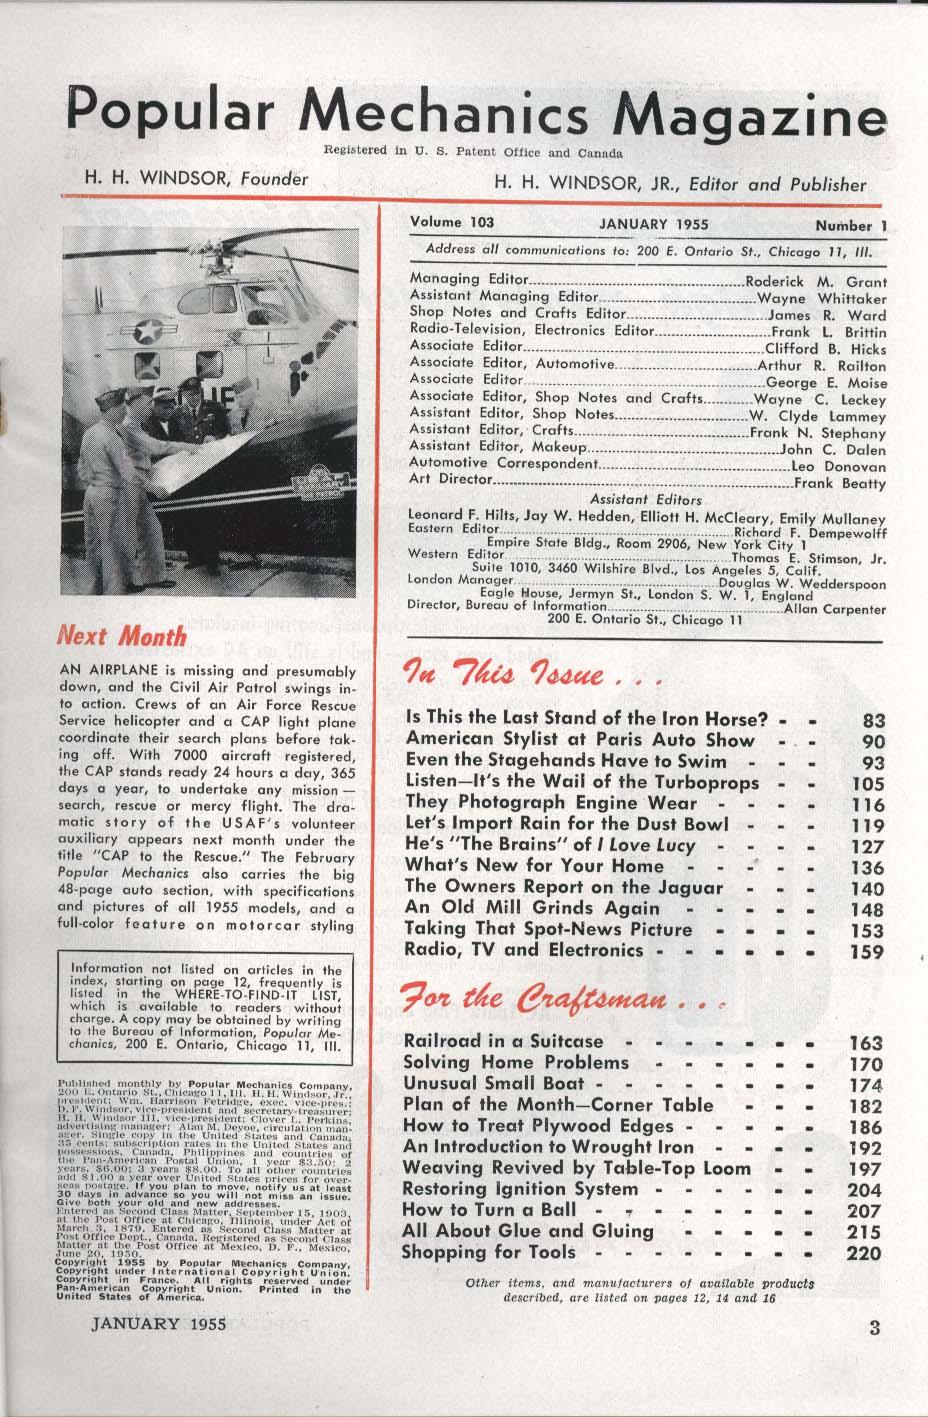 POPULAR MECHANICS Locomotives American Stylist Paris Auto Show ++ 1 1955